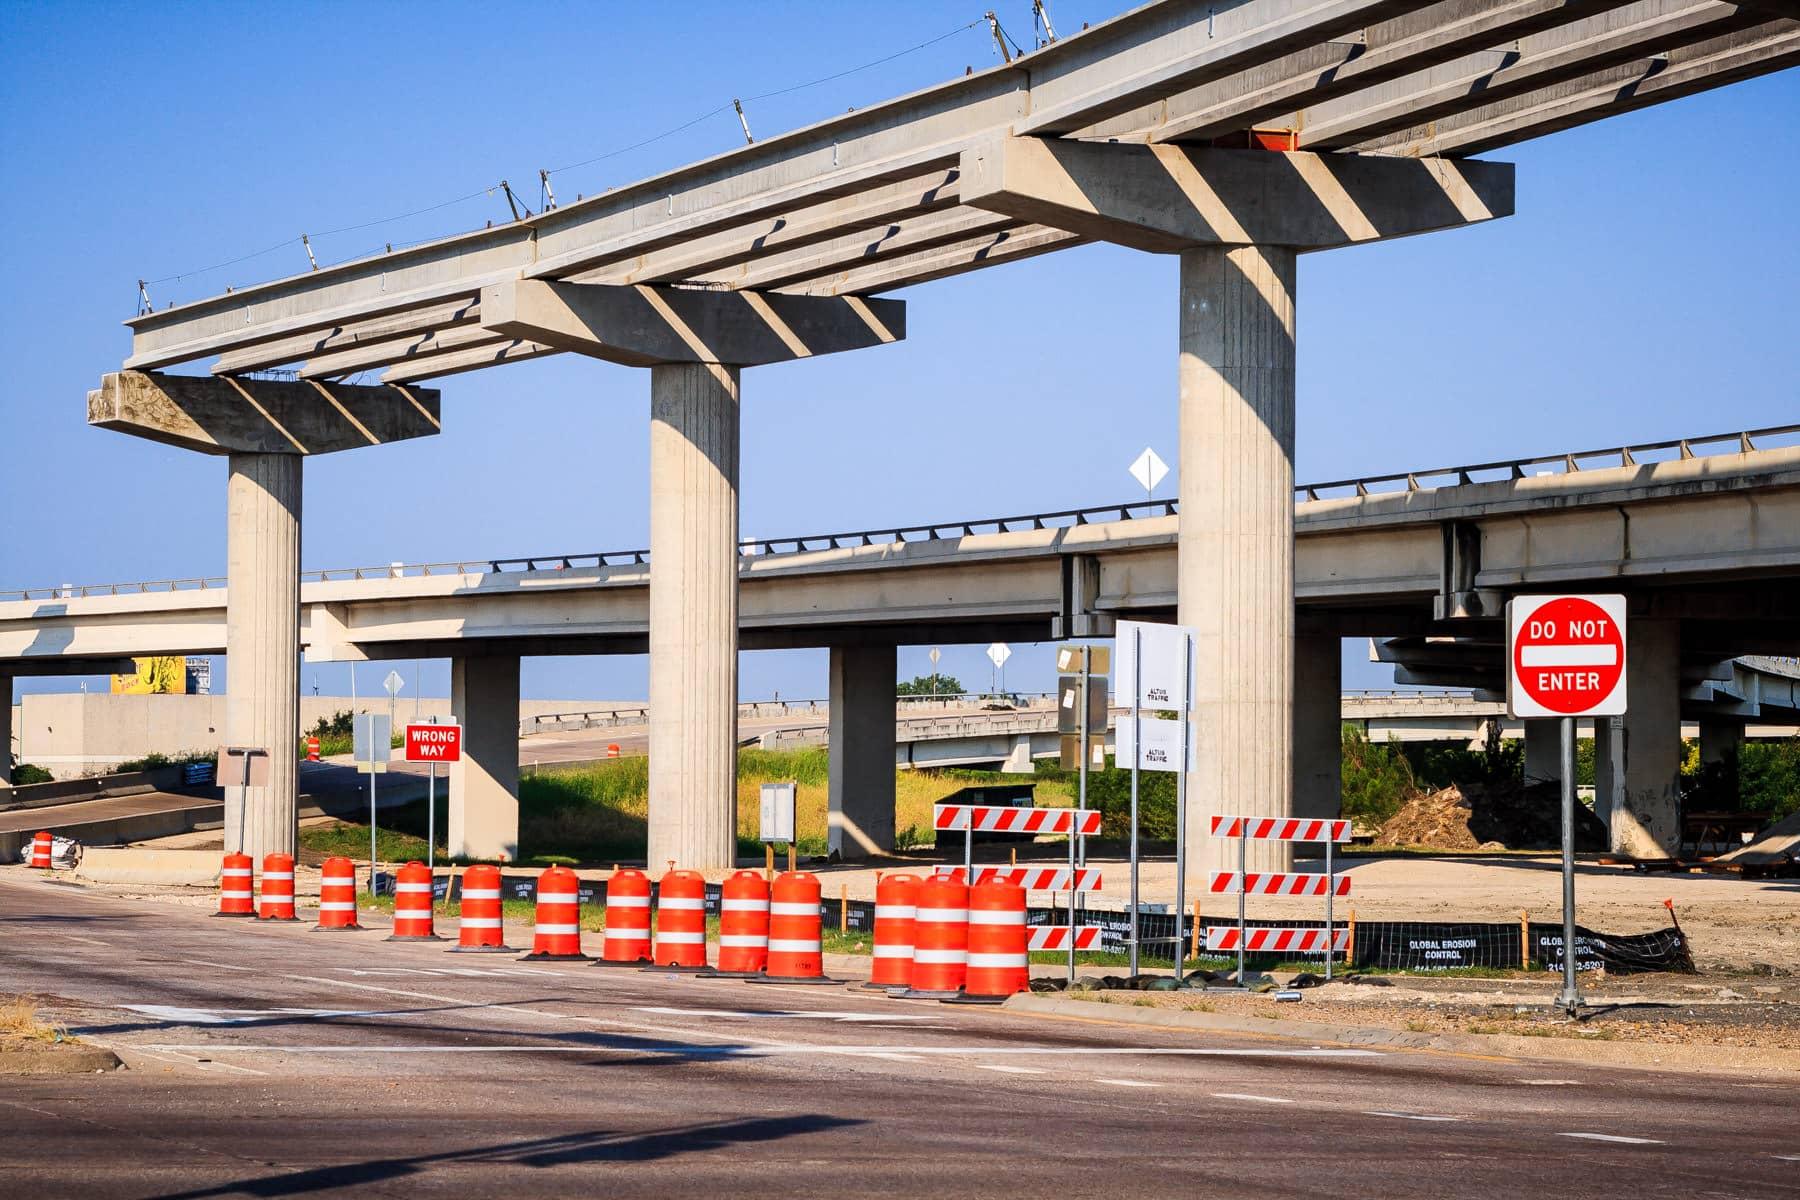 Road construction in Dallas.